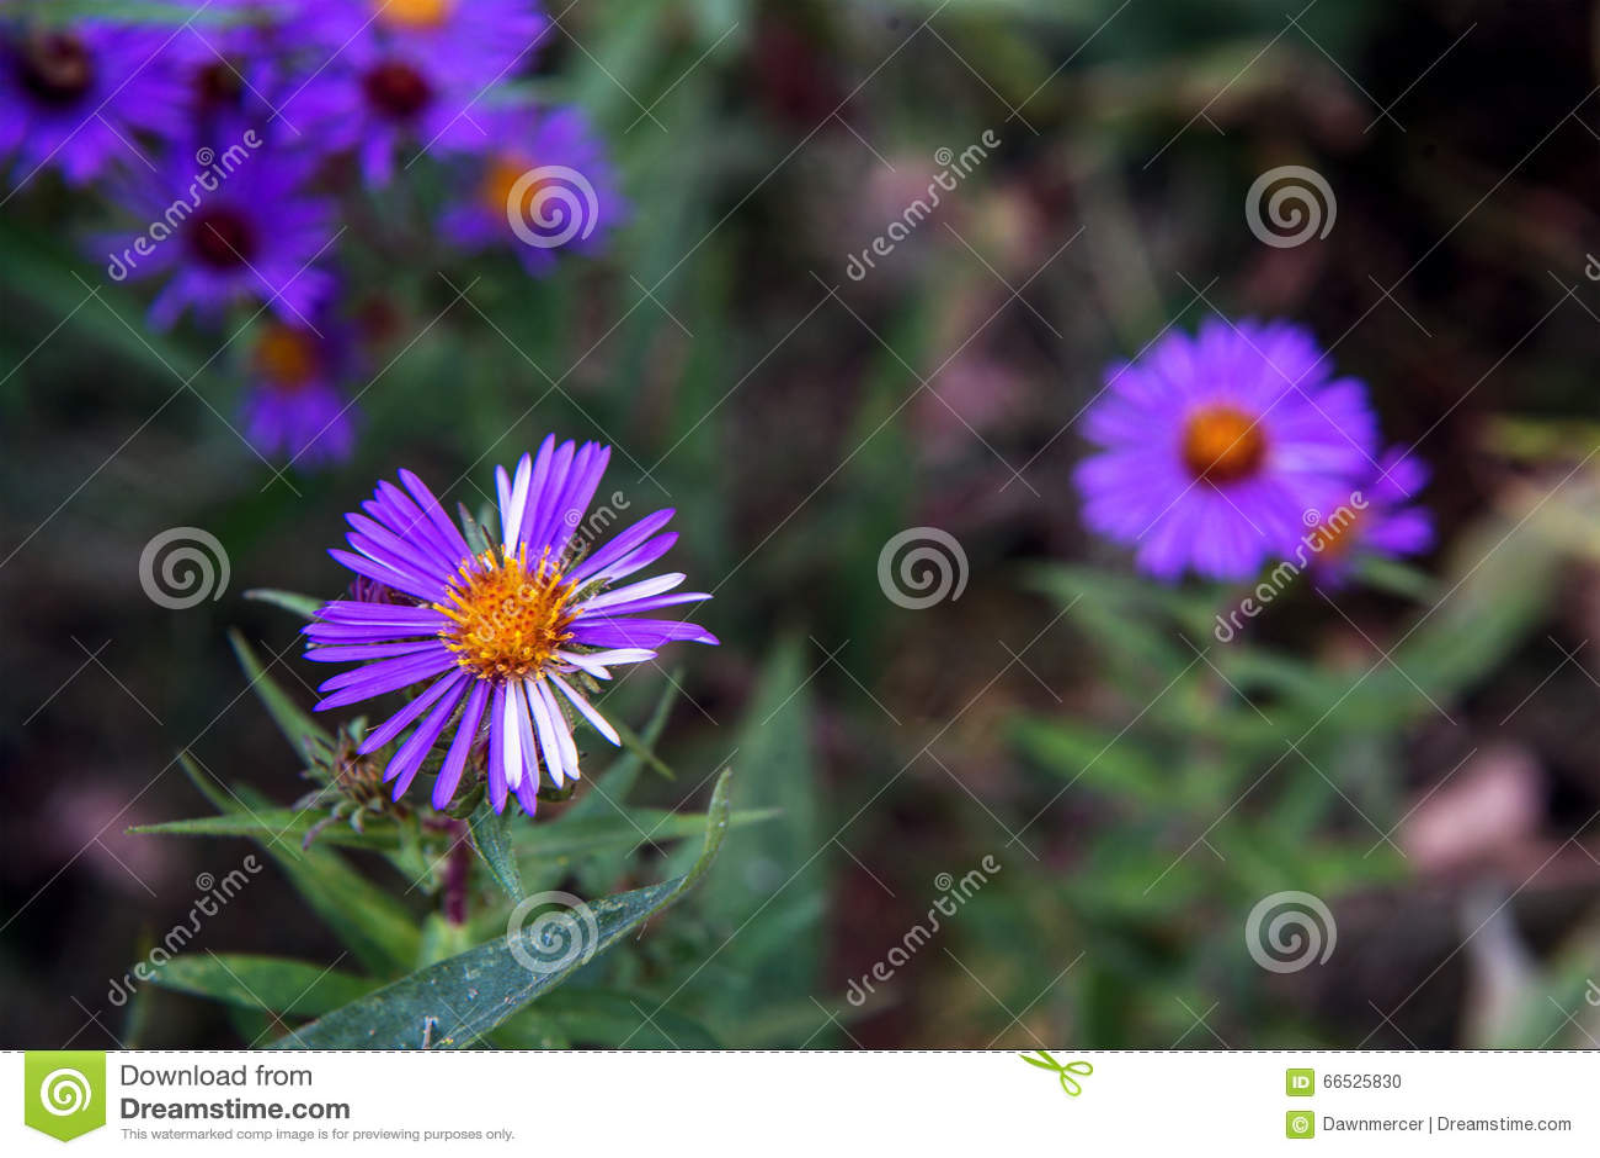 Pretty purple and white aster flowers stock photo image of download pretty purple and white aster flowers stock photo image of ornamental aster mightylinksfo